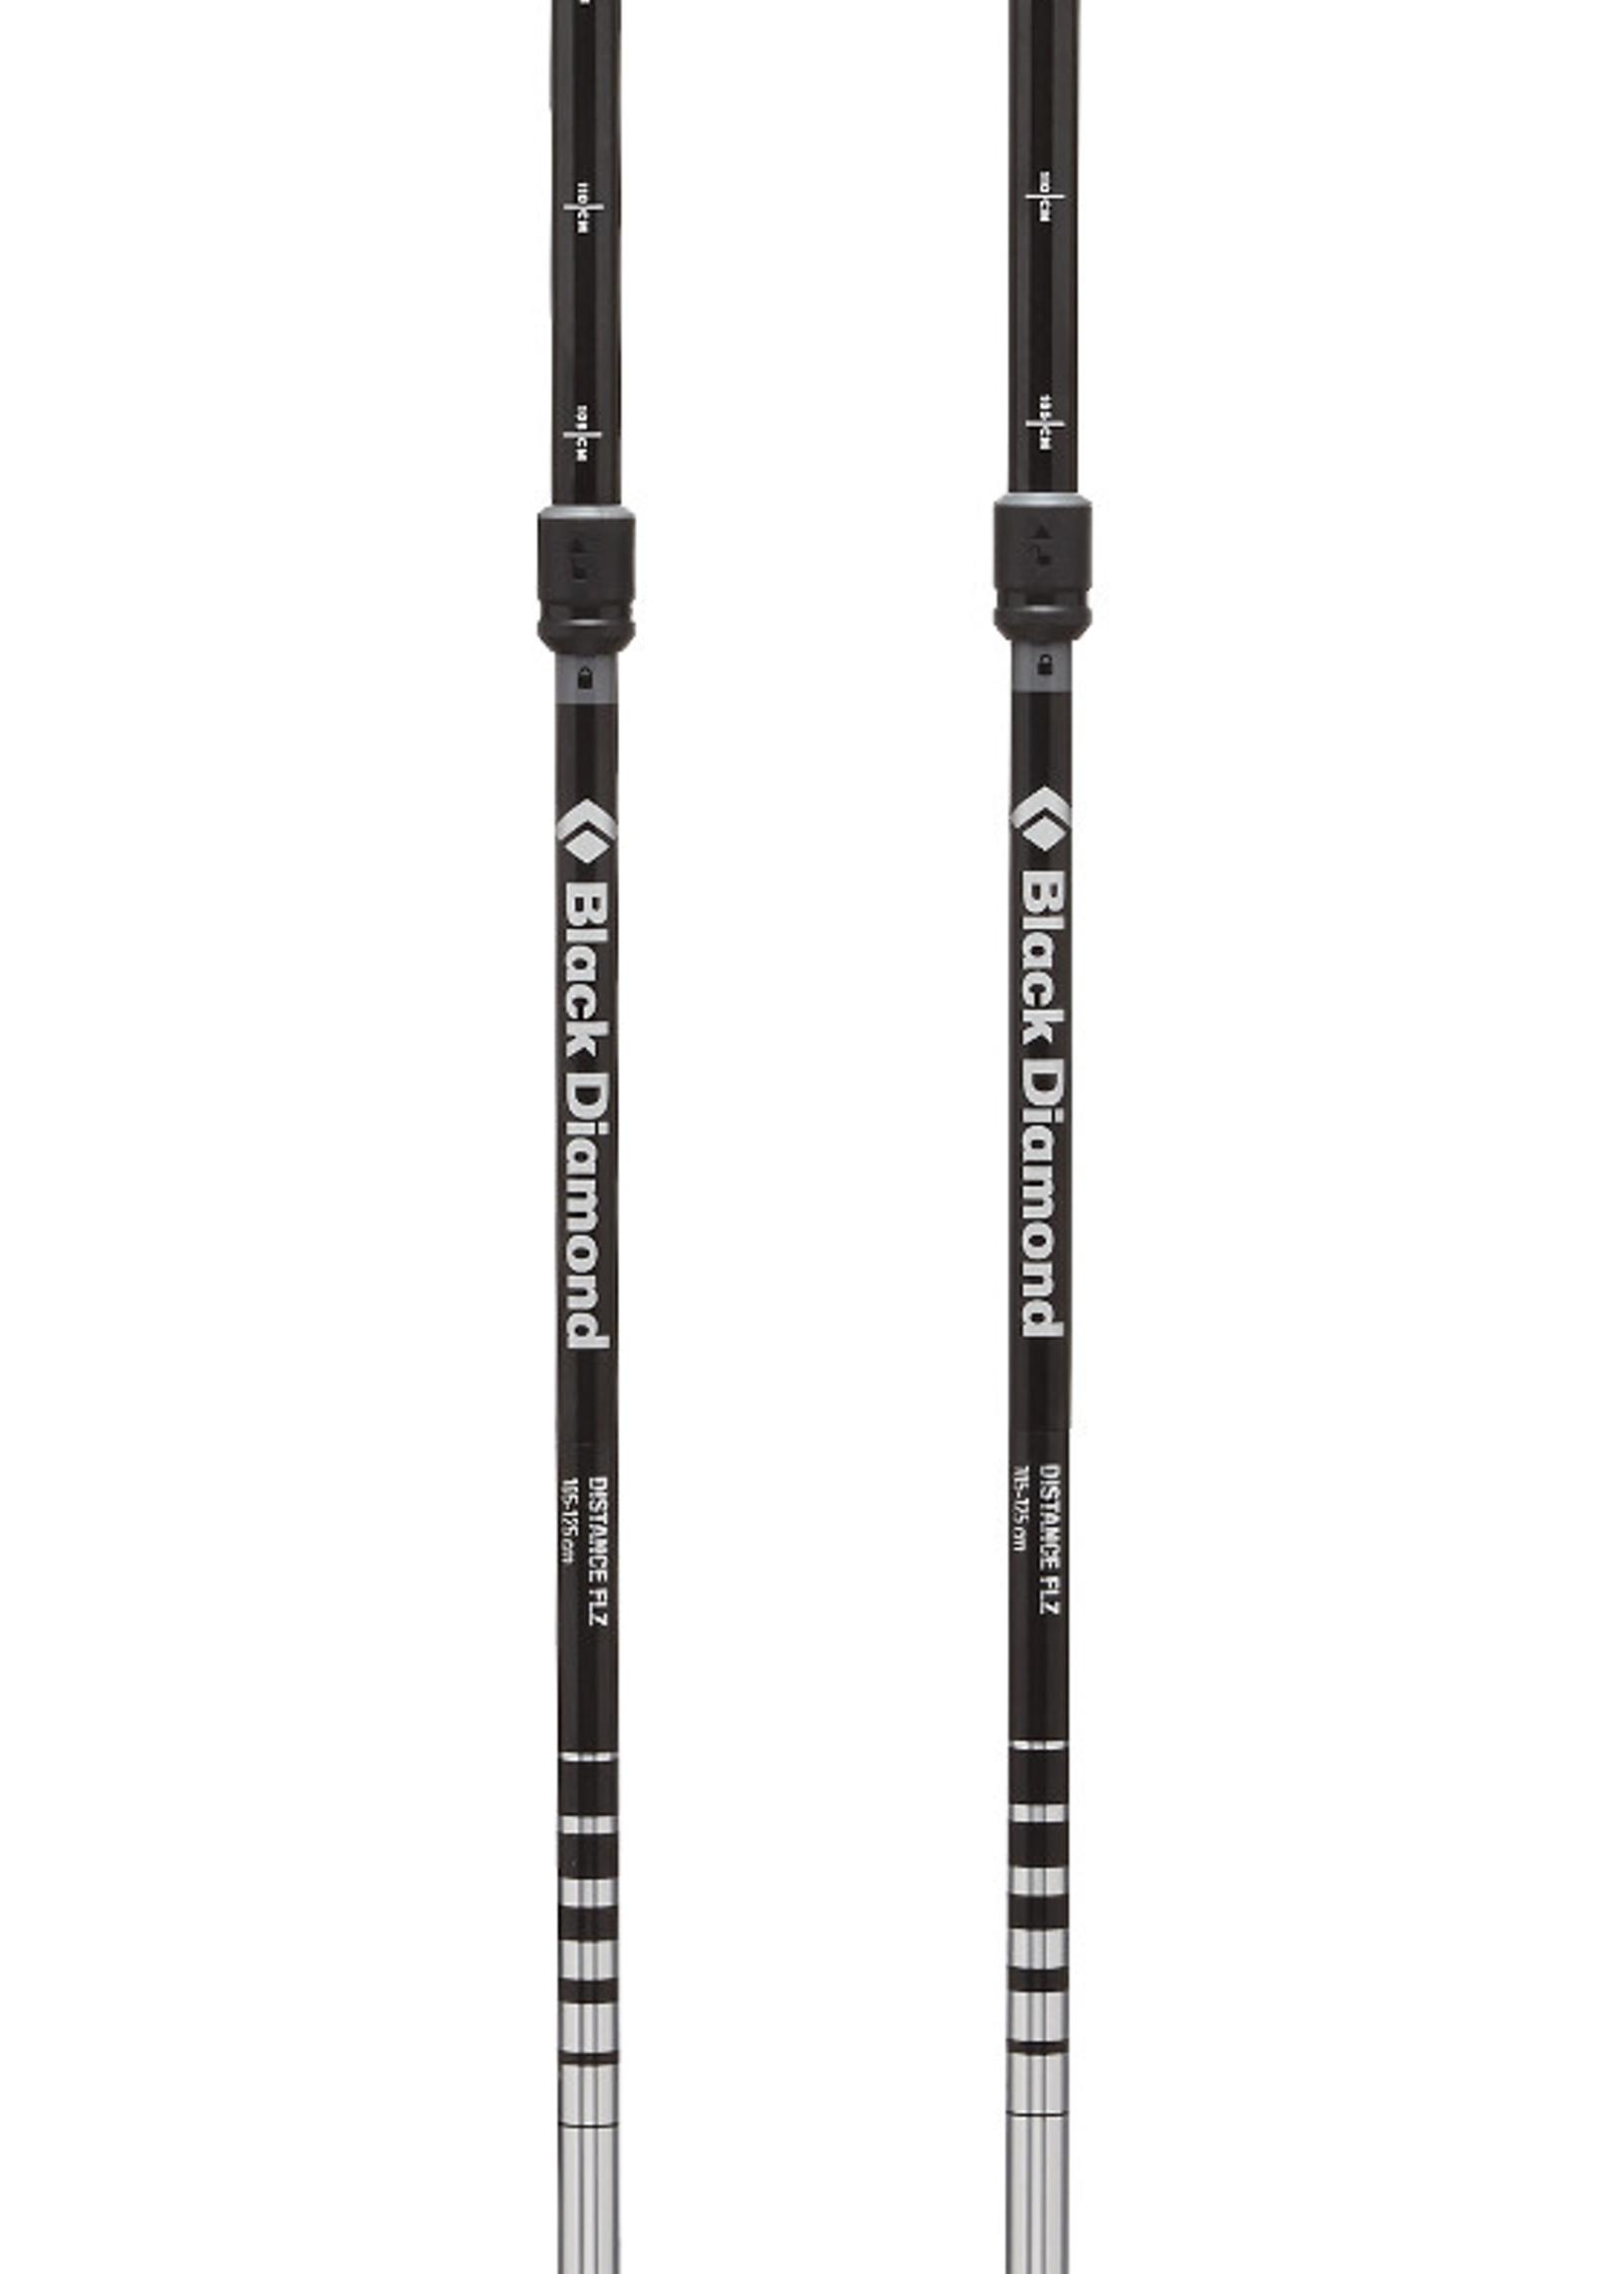 Black Diamond Distance Flz Z-Poles 125